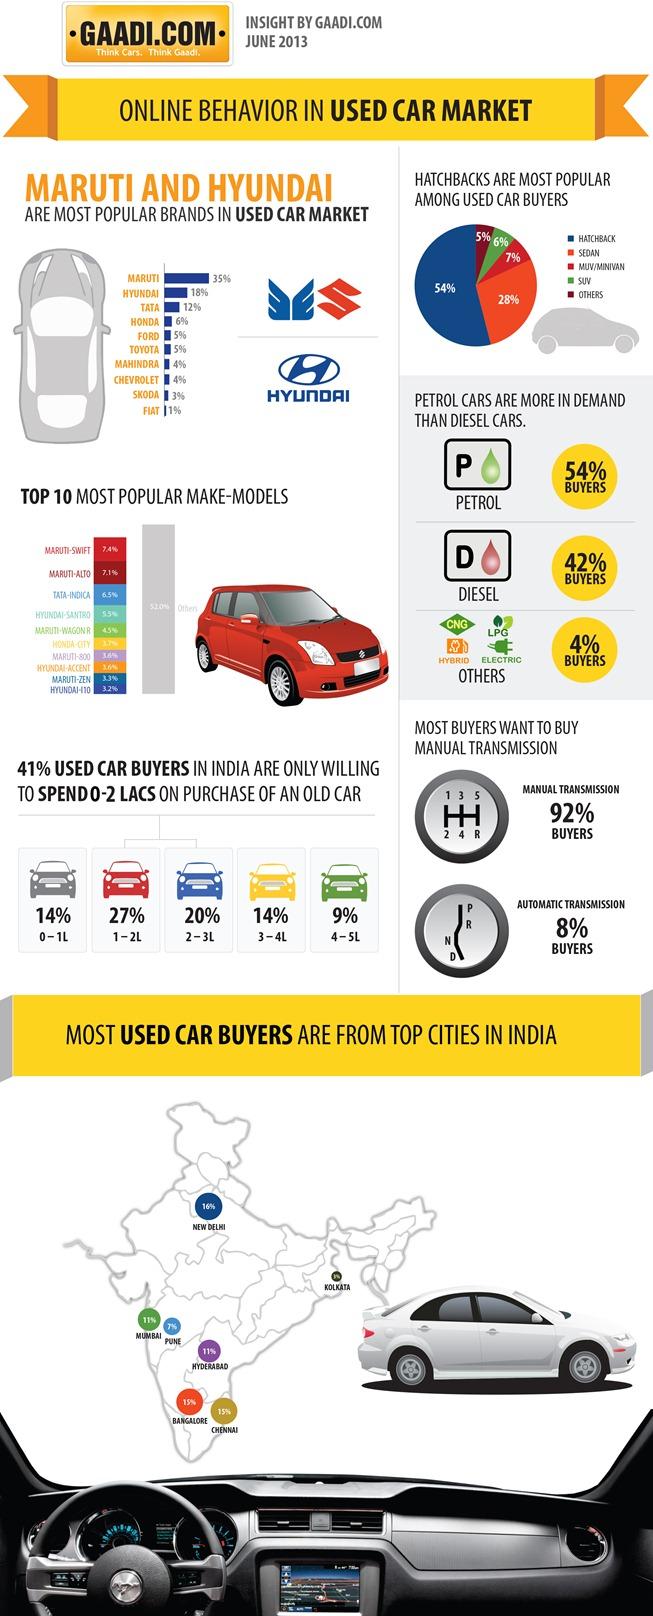 online-behaviour-in-used-car-market_5211e2cc3f579